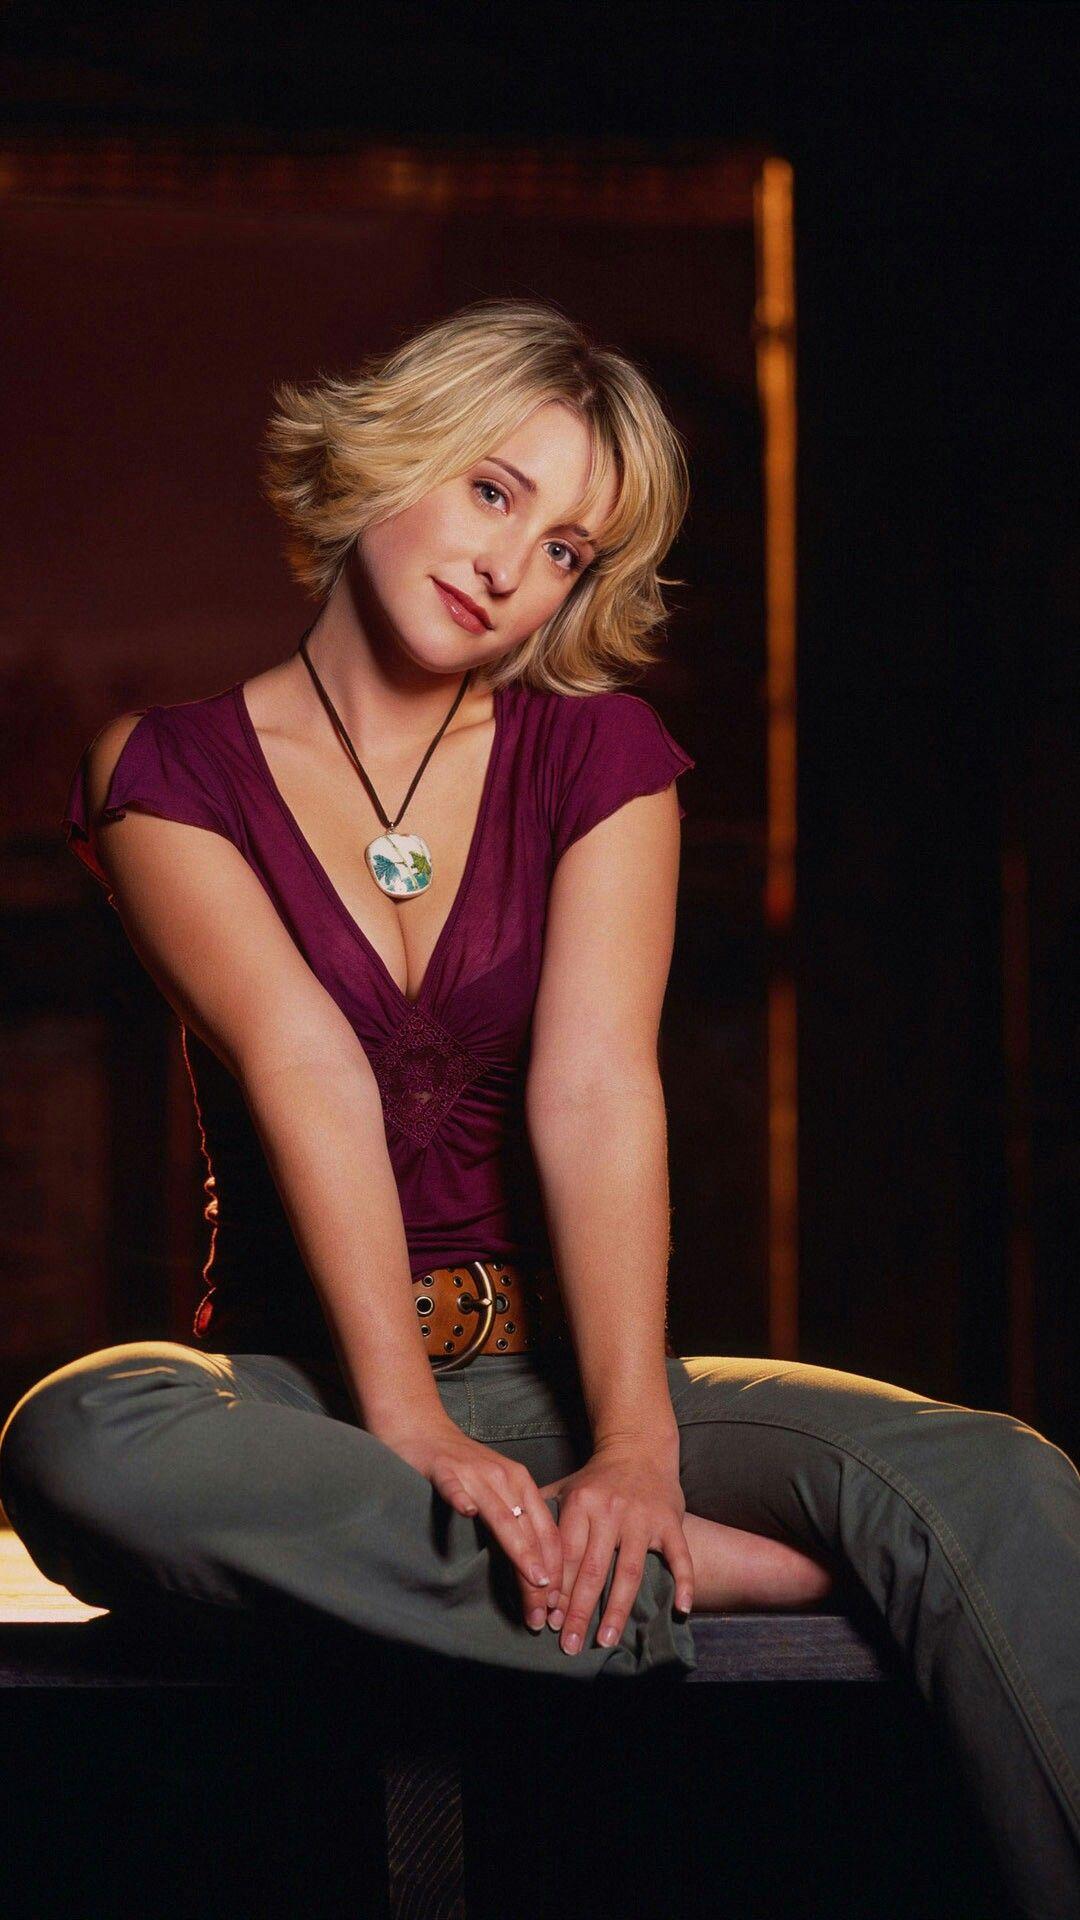 Allison Mack Celebrity Pictures Actors Actresses